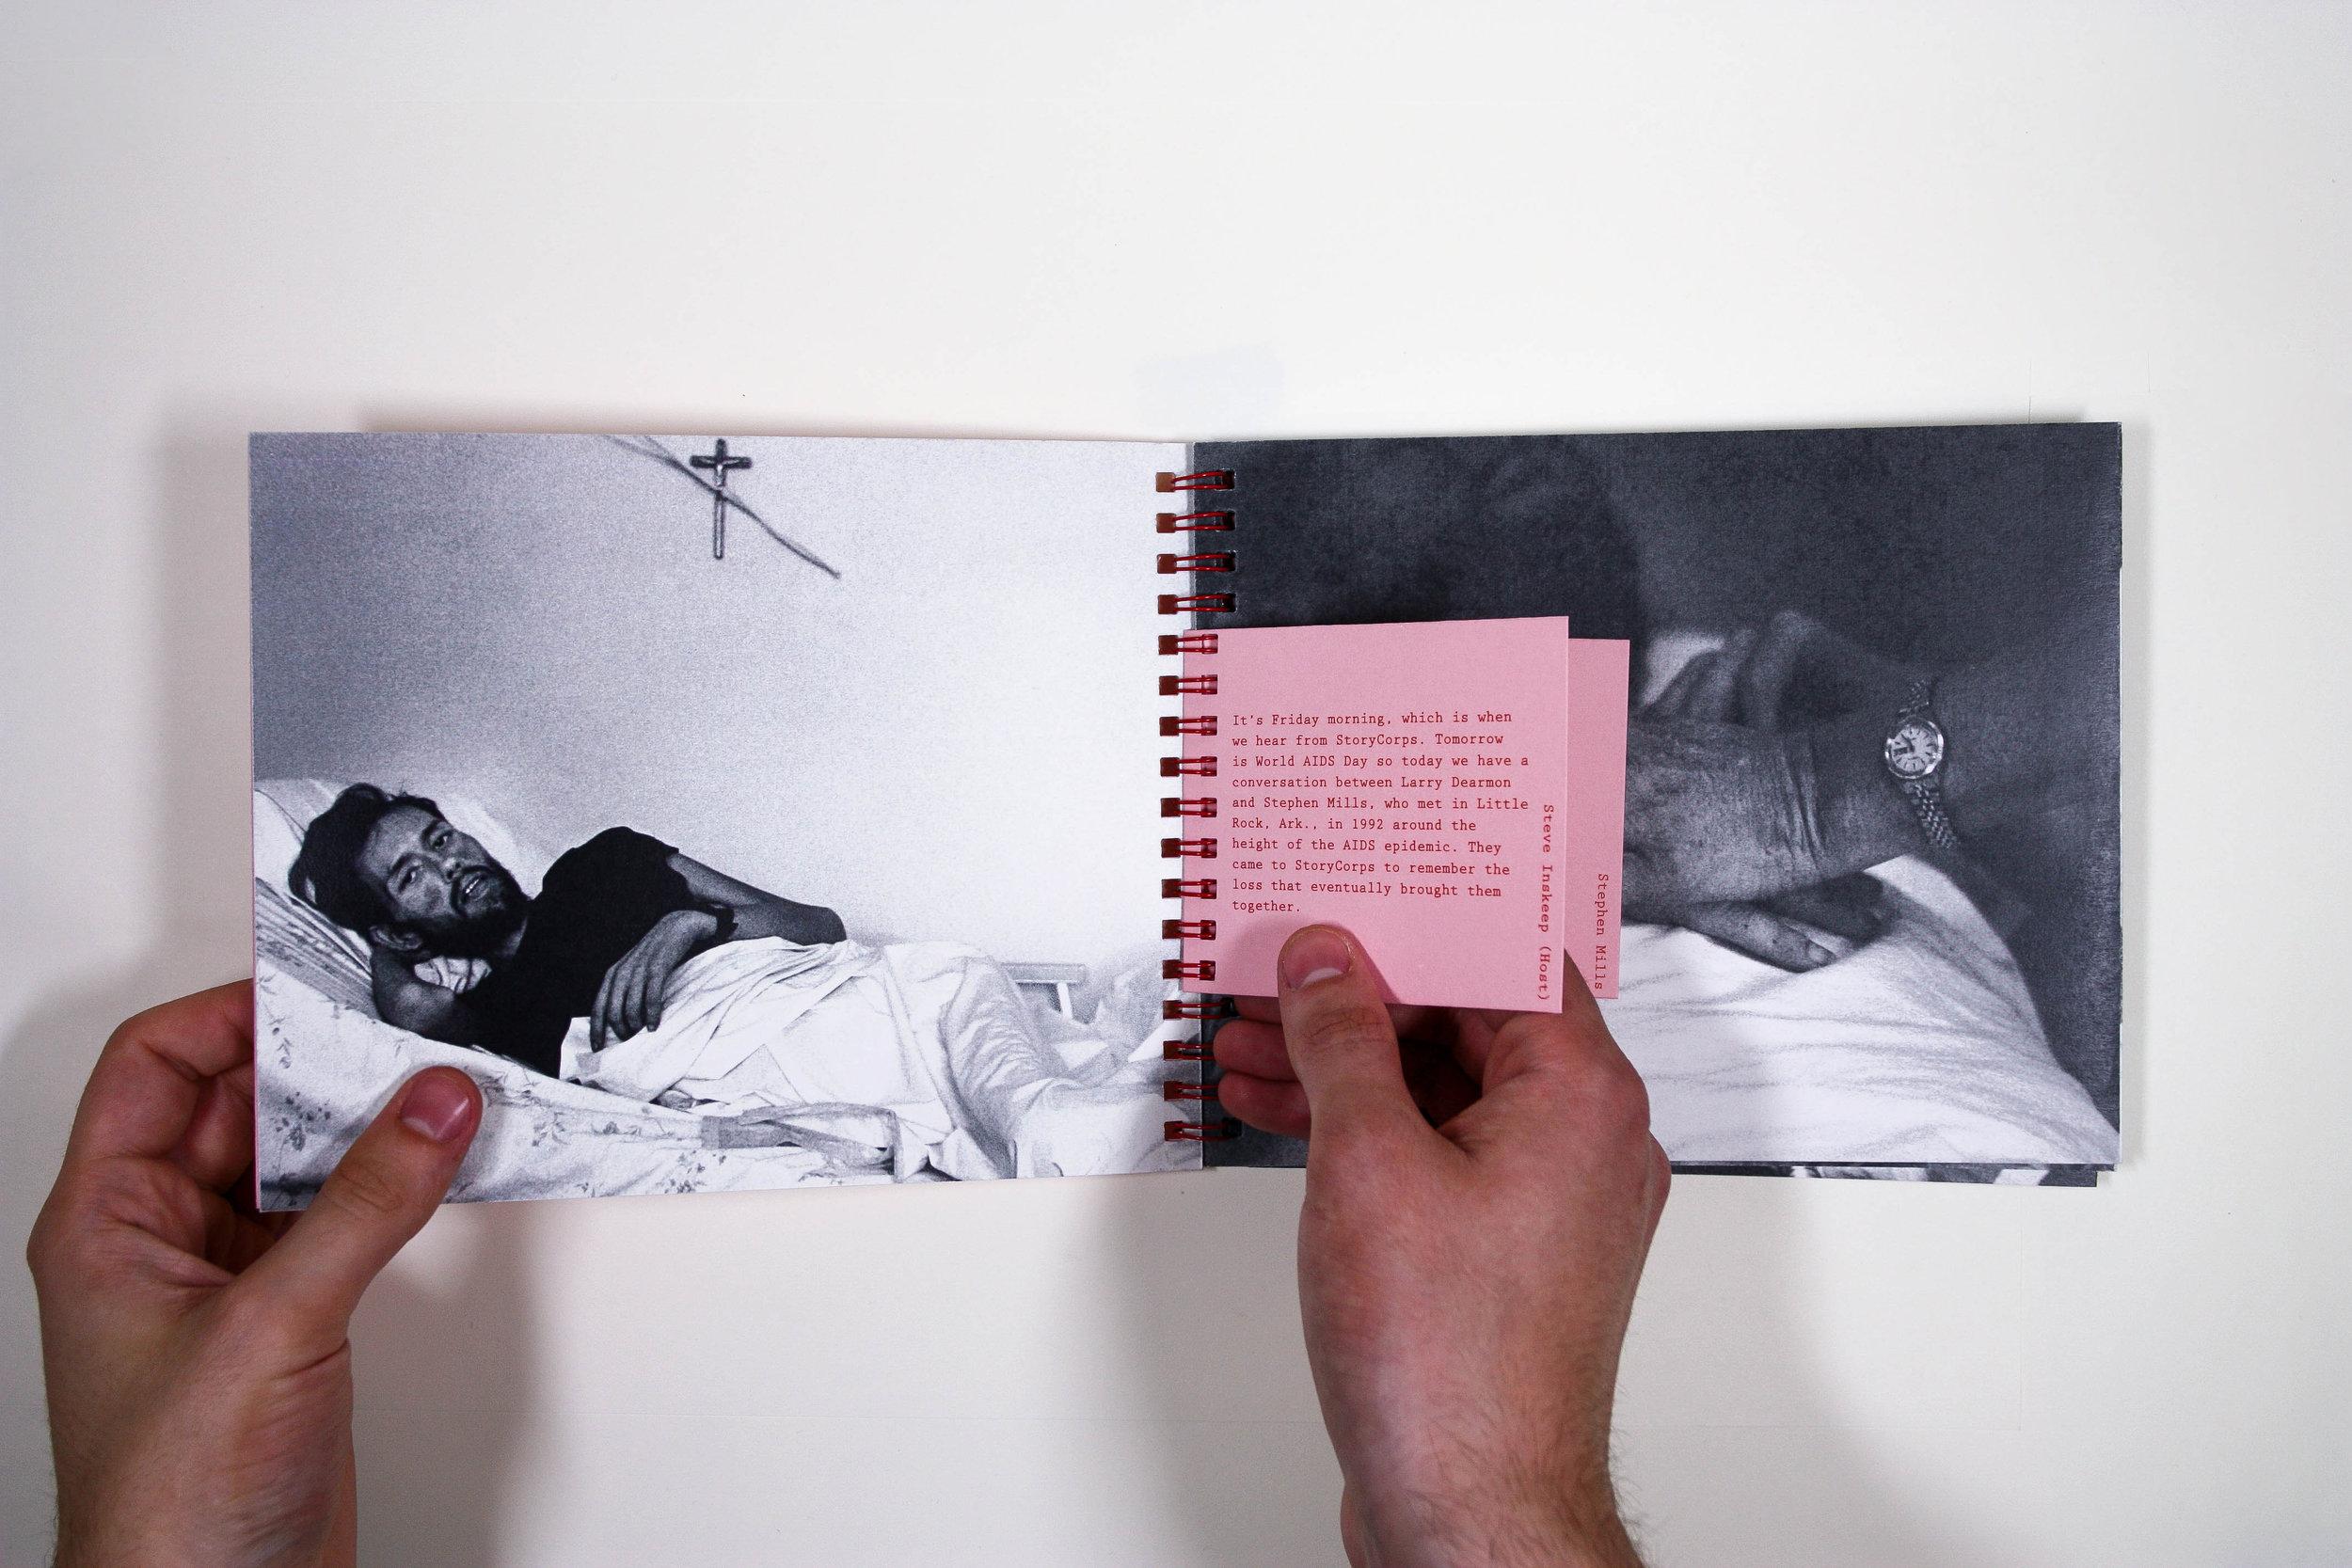 estory-bookimages-29.jpg